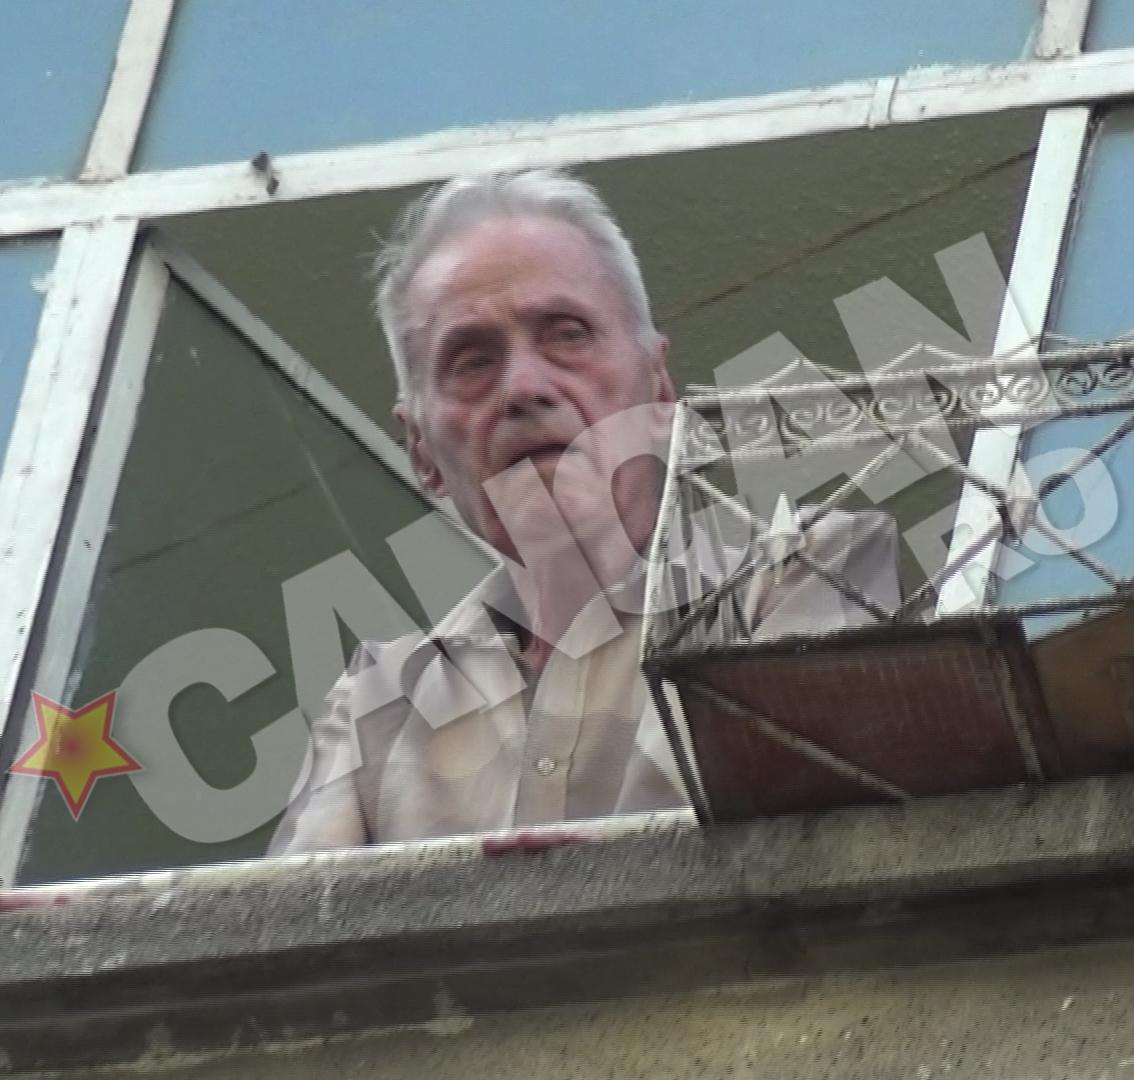 Inainte sa mearga la magazin, Visinescu a inspectat zona din apartamentul sau aflat la etajul 3